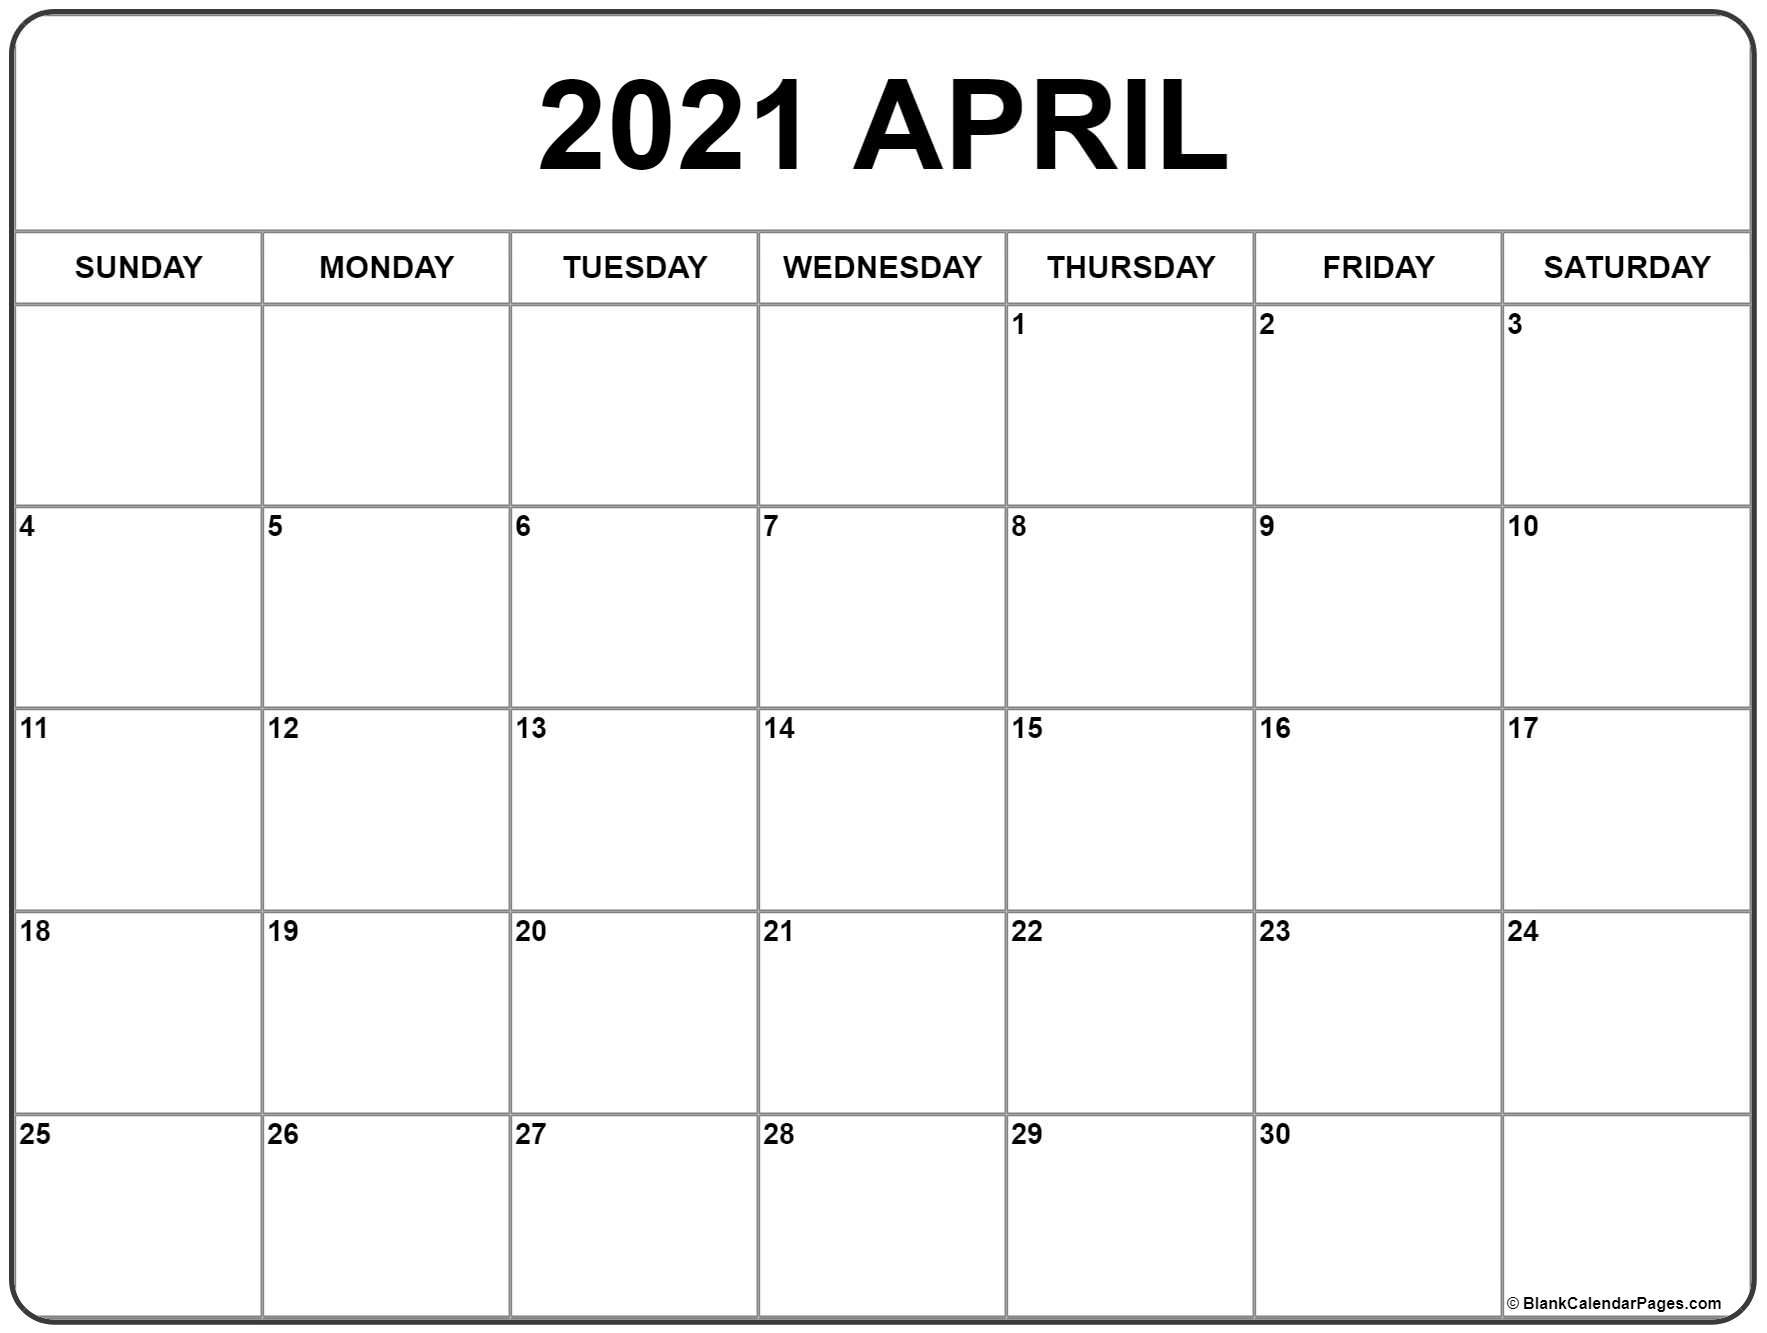 Catch Calendar April 2021 March 2021